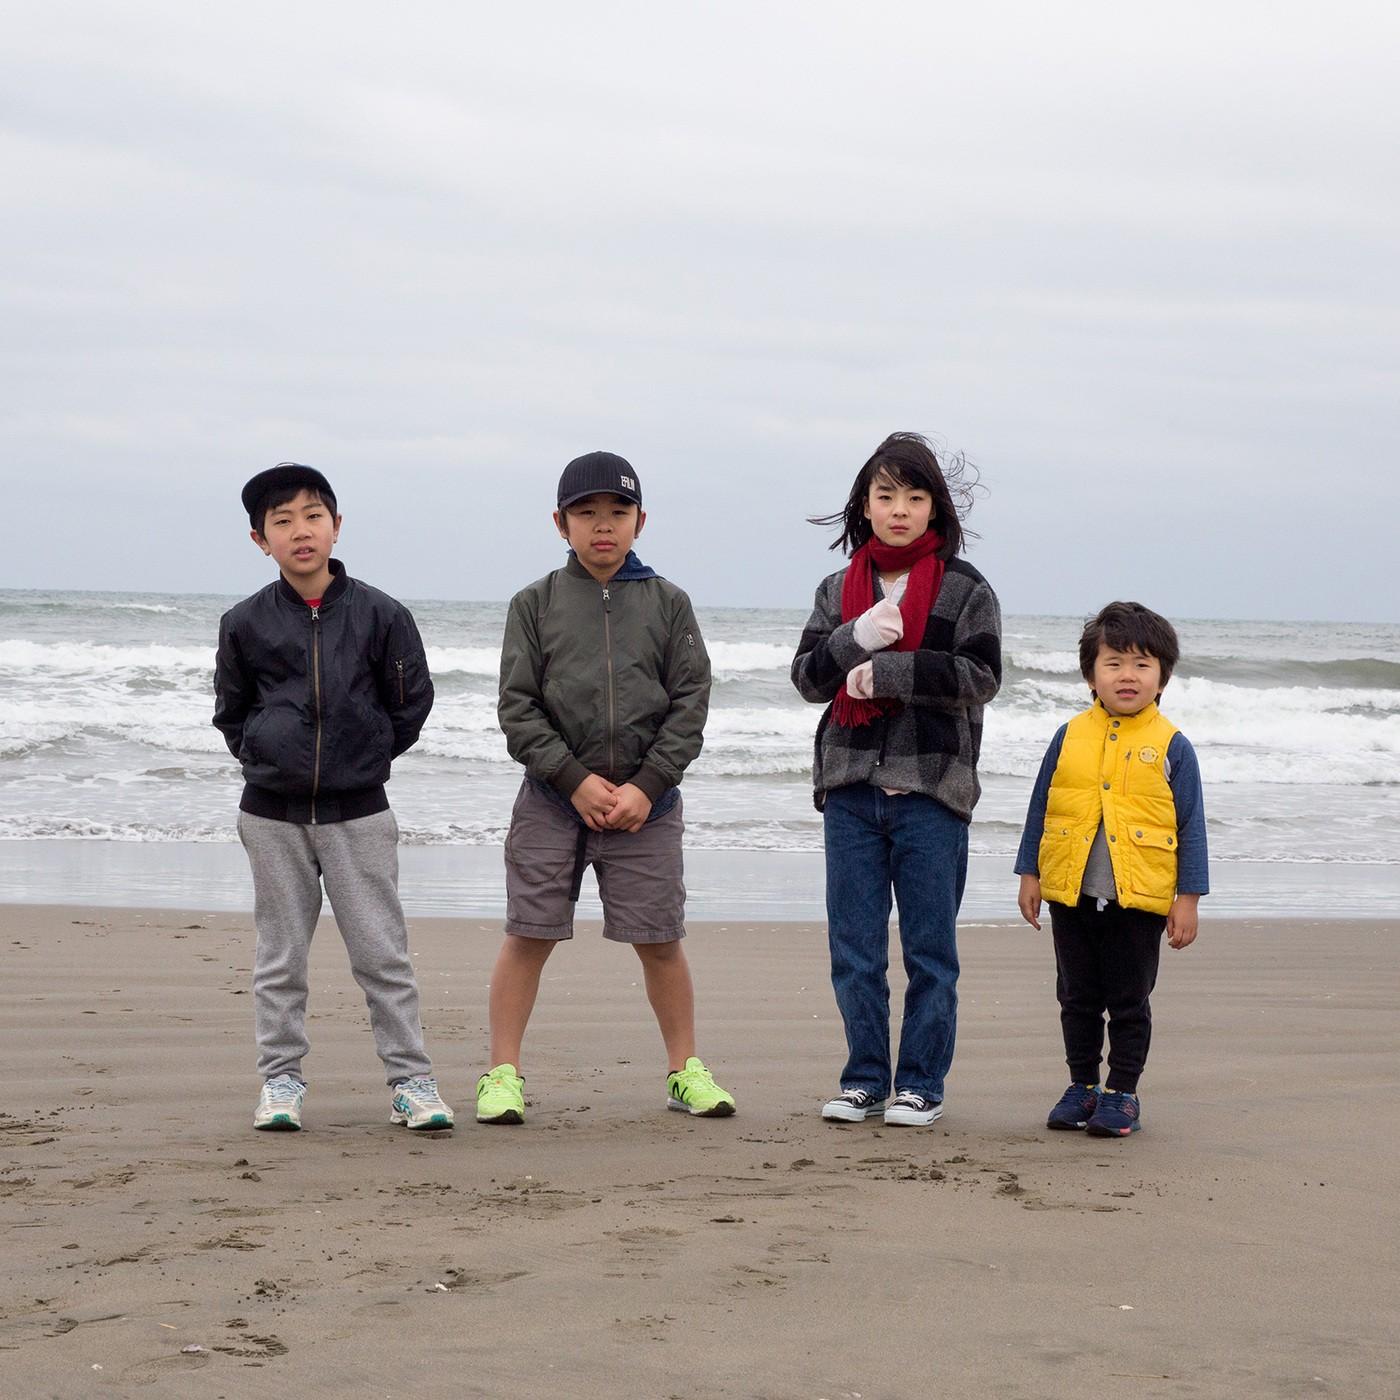 Sunny Day Service (サニーデイ・サービス) – the SEA [FLAC / WEB] [2018.08.08]